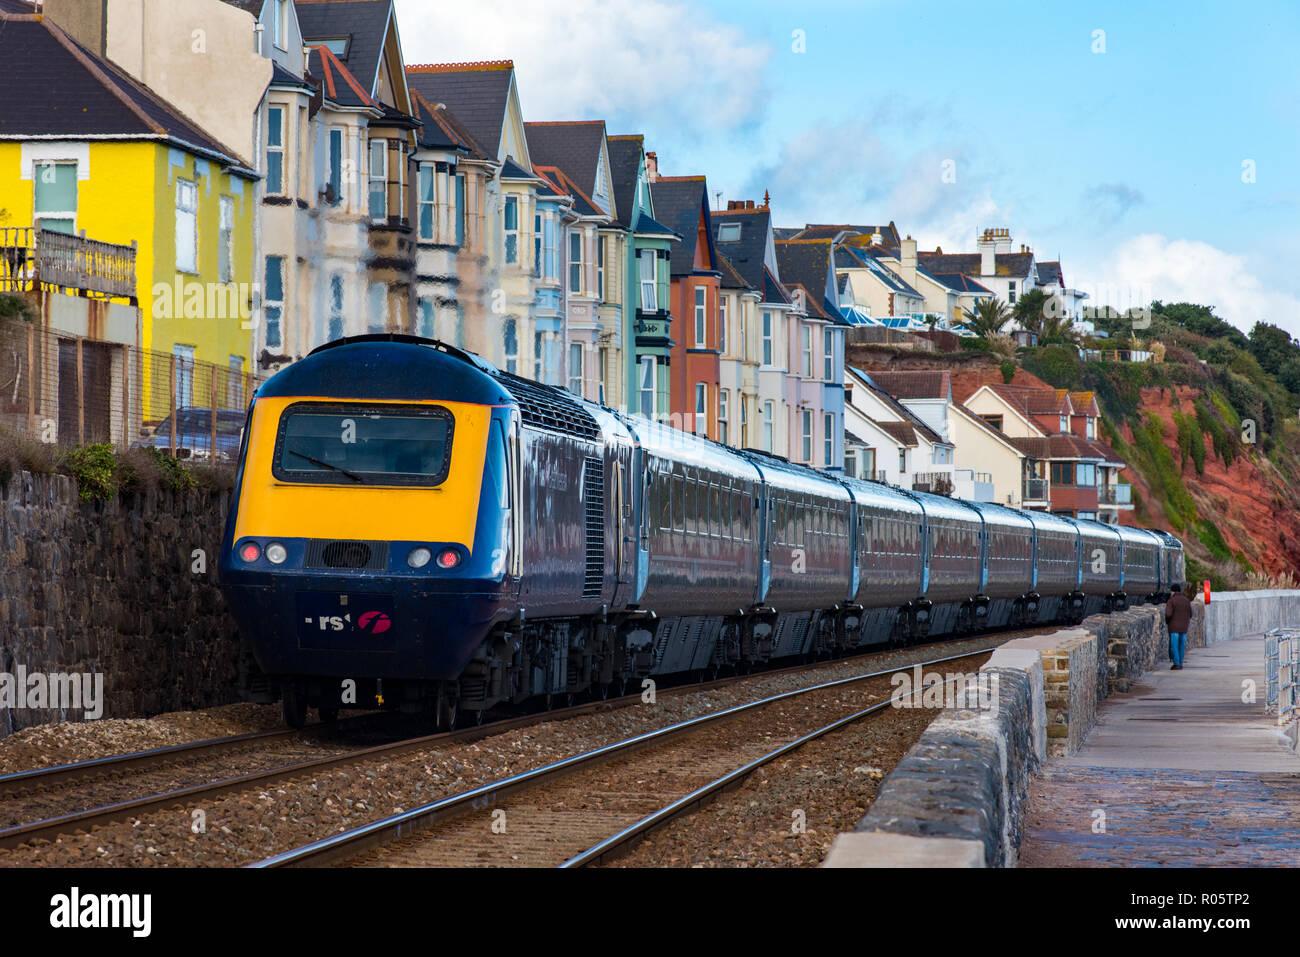 DAWLISH, DEVON, UK - 26OCT2018: GWR Class 43 Train moving north away from Dawlish Station. - Stock Image